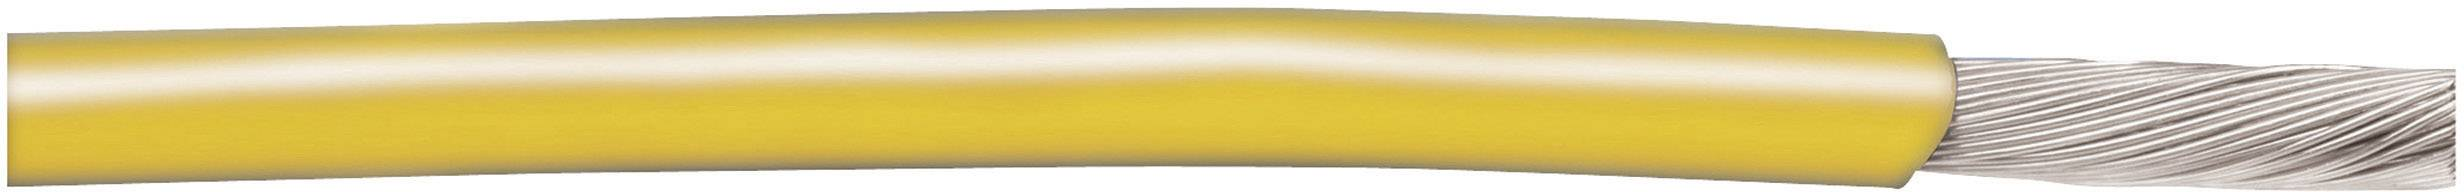 Opletenie / lanko AlphaWire 3077-005-YEL 1 x 1.31 mm², vonkajší Ø 3.14 mm, 30.5 m, žltá